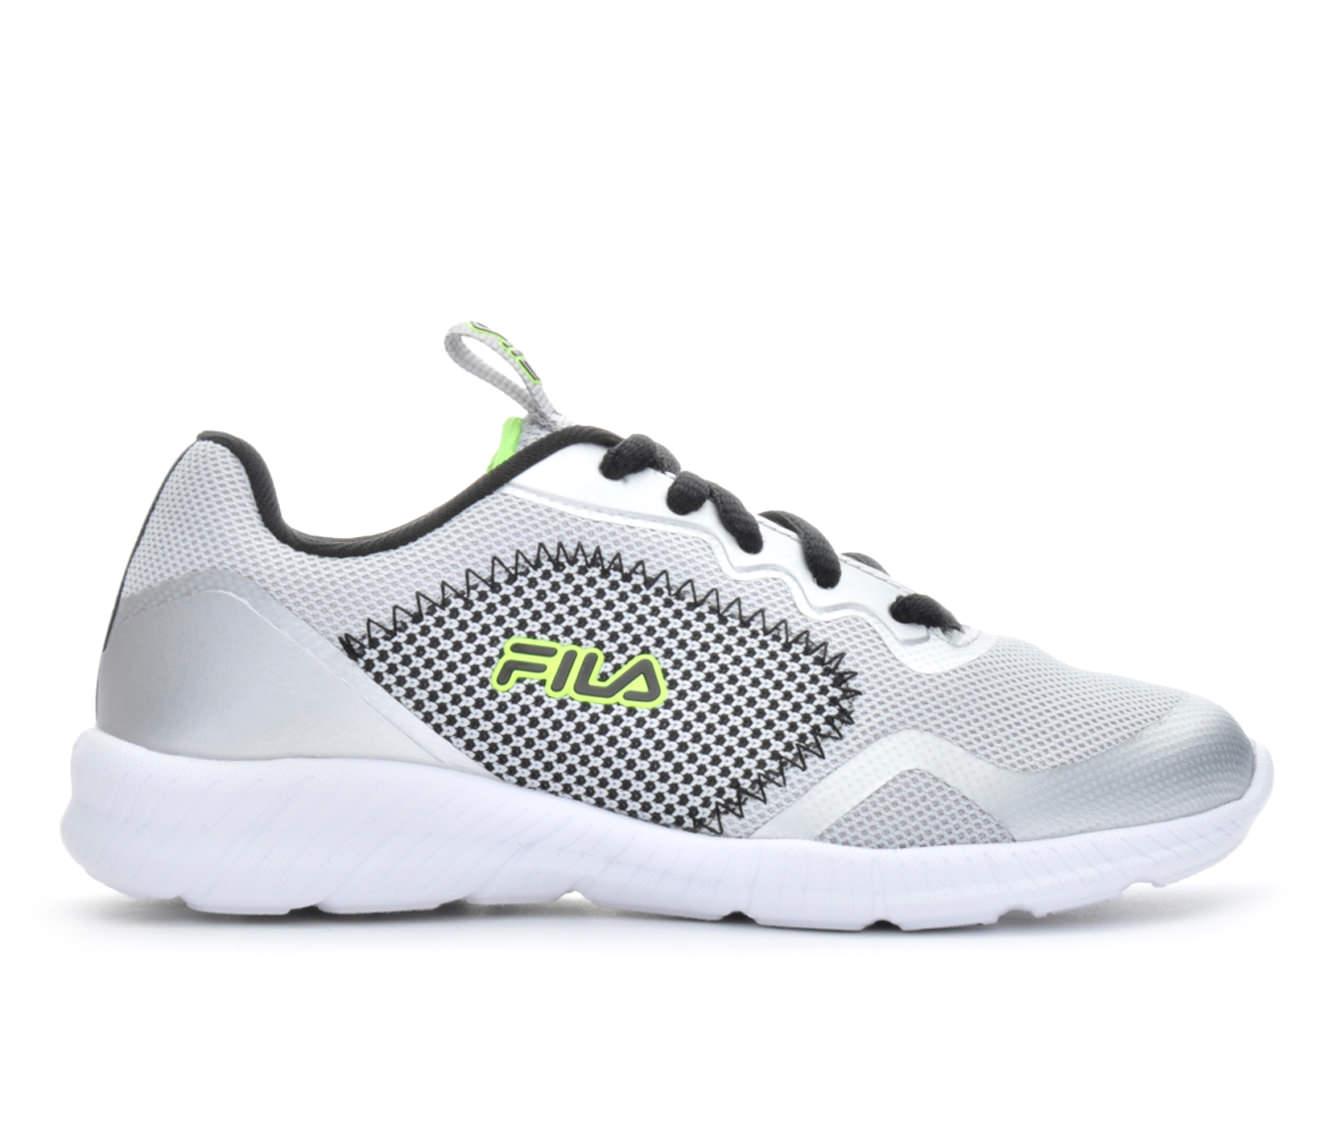 Boys' Fila Showcase 3 Running Shoes (Silver)